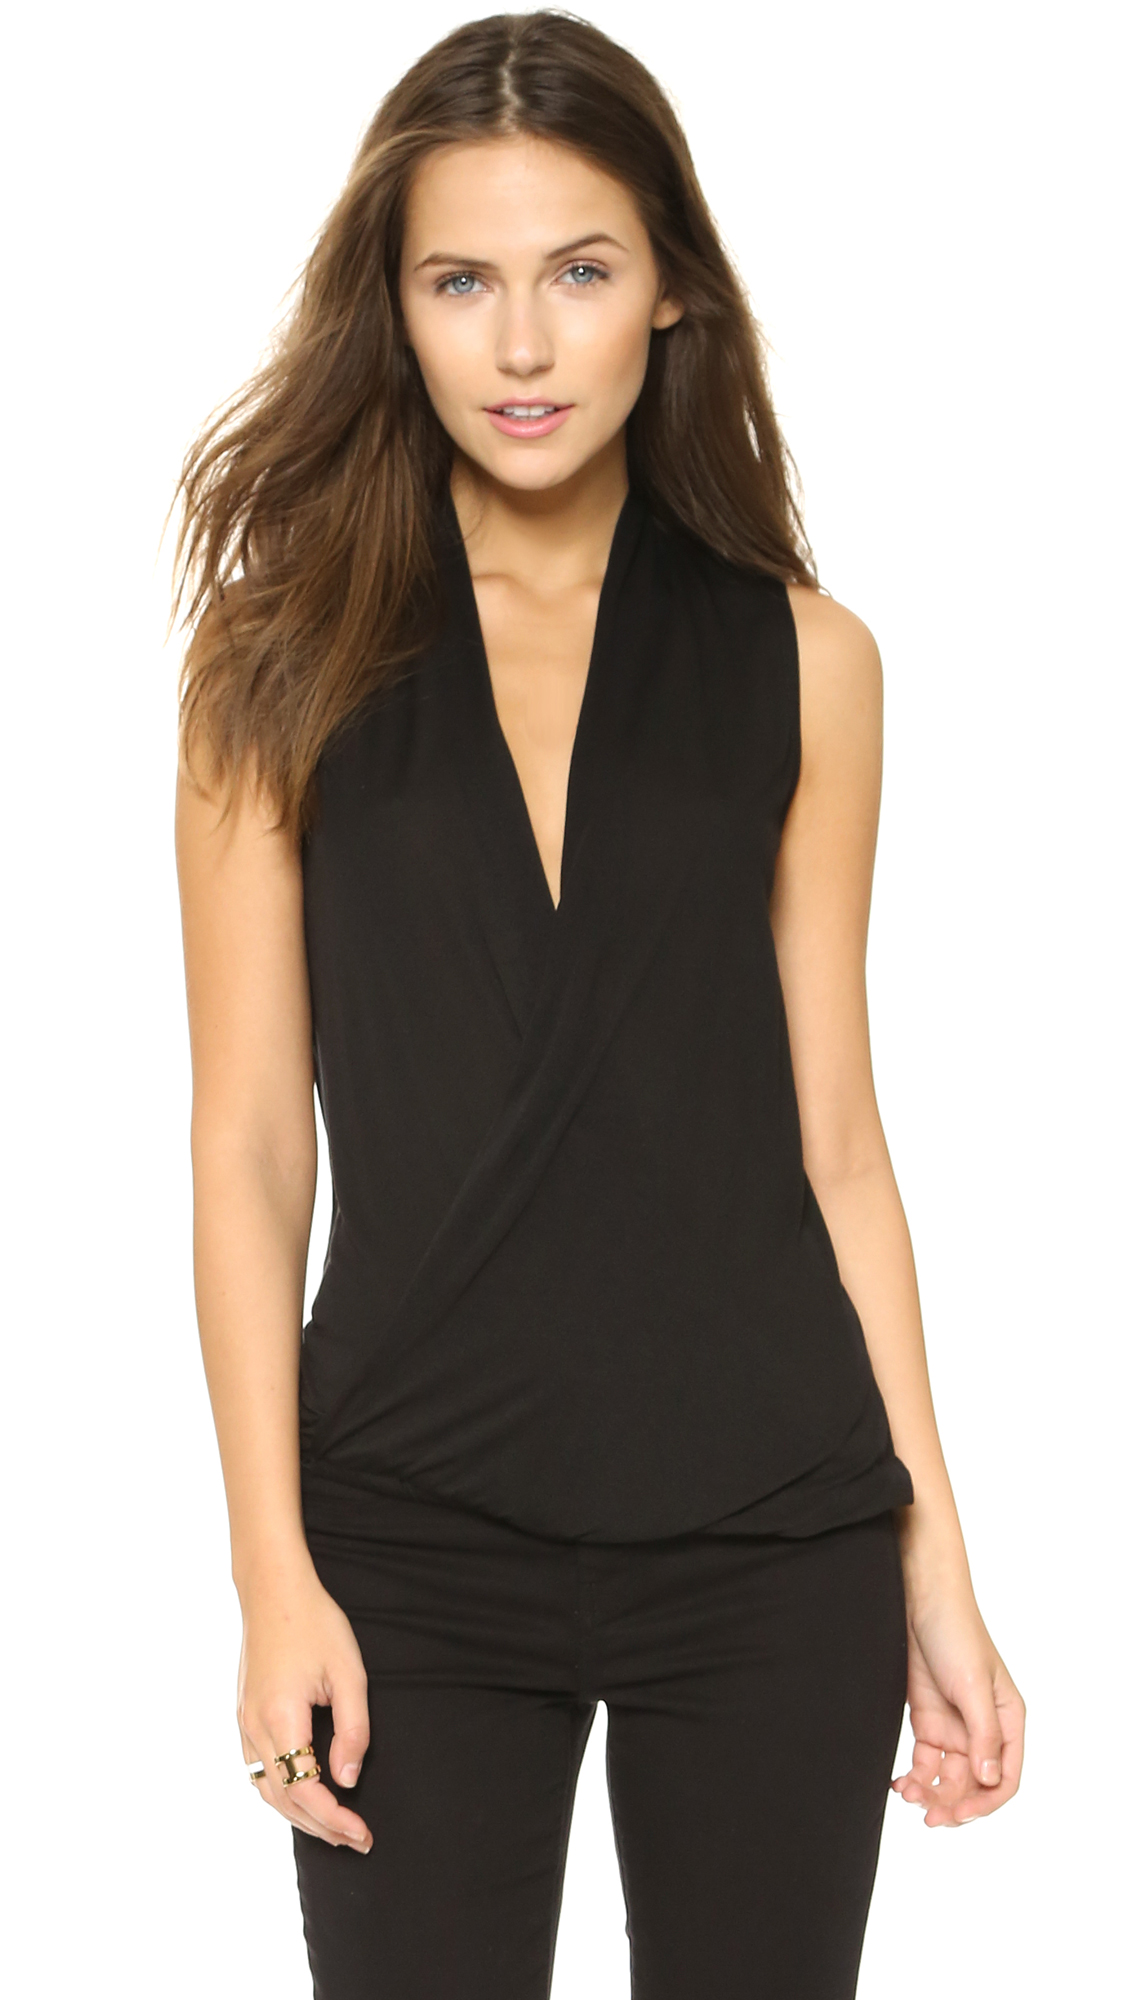 Lanston Surplice Pullover Top - Black